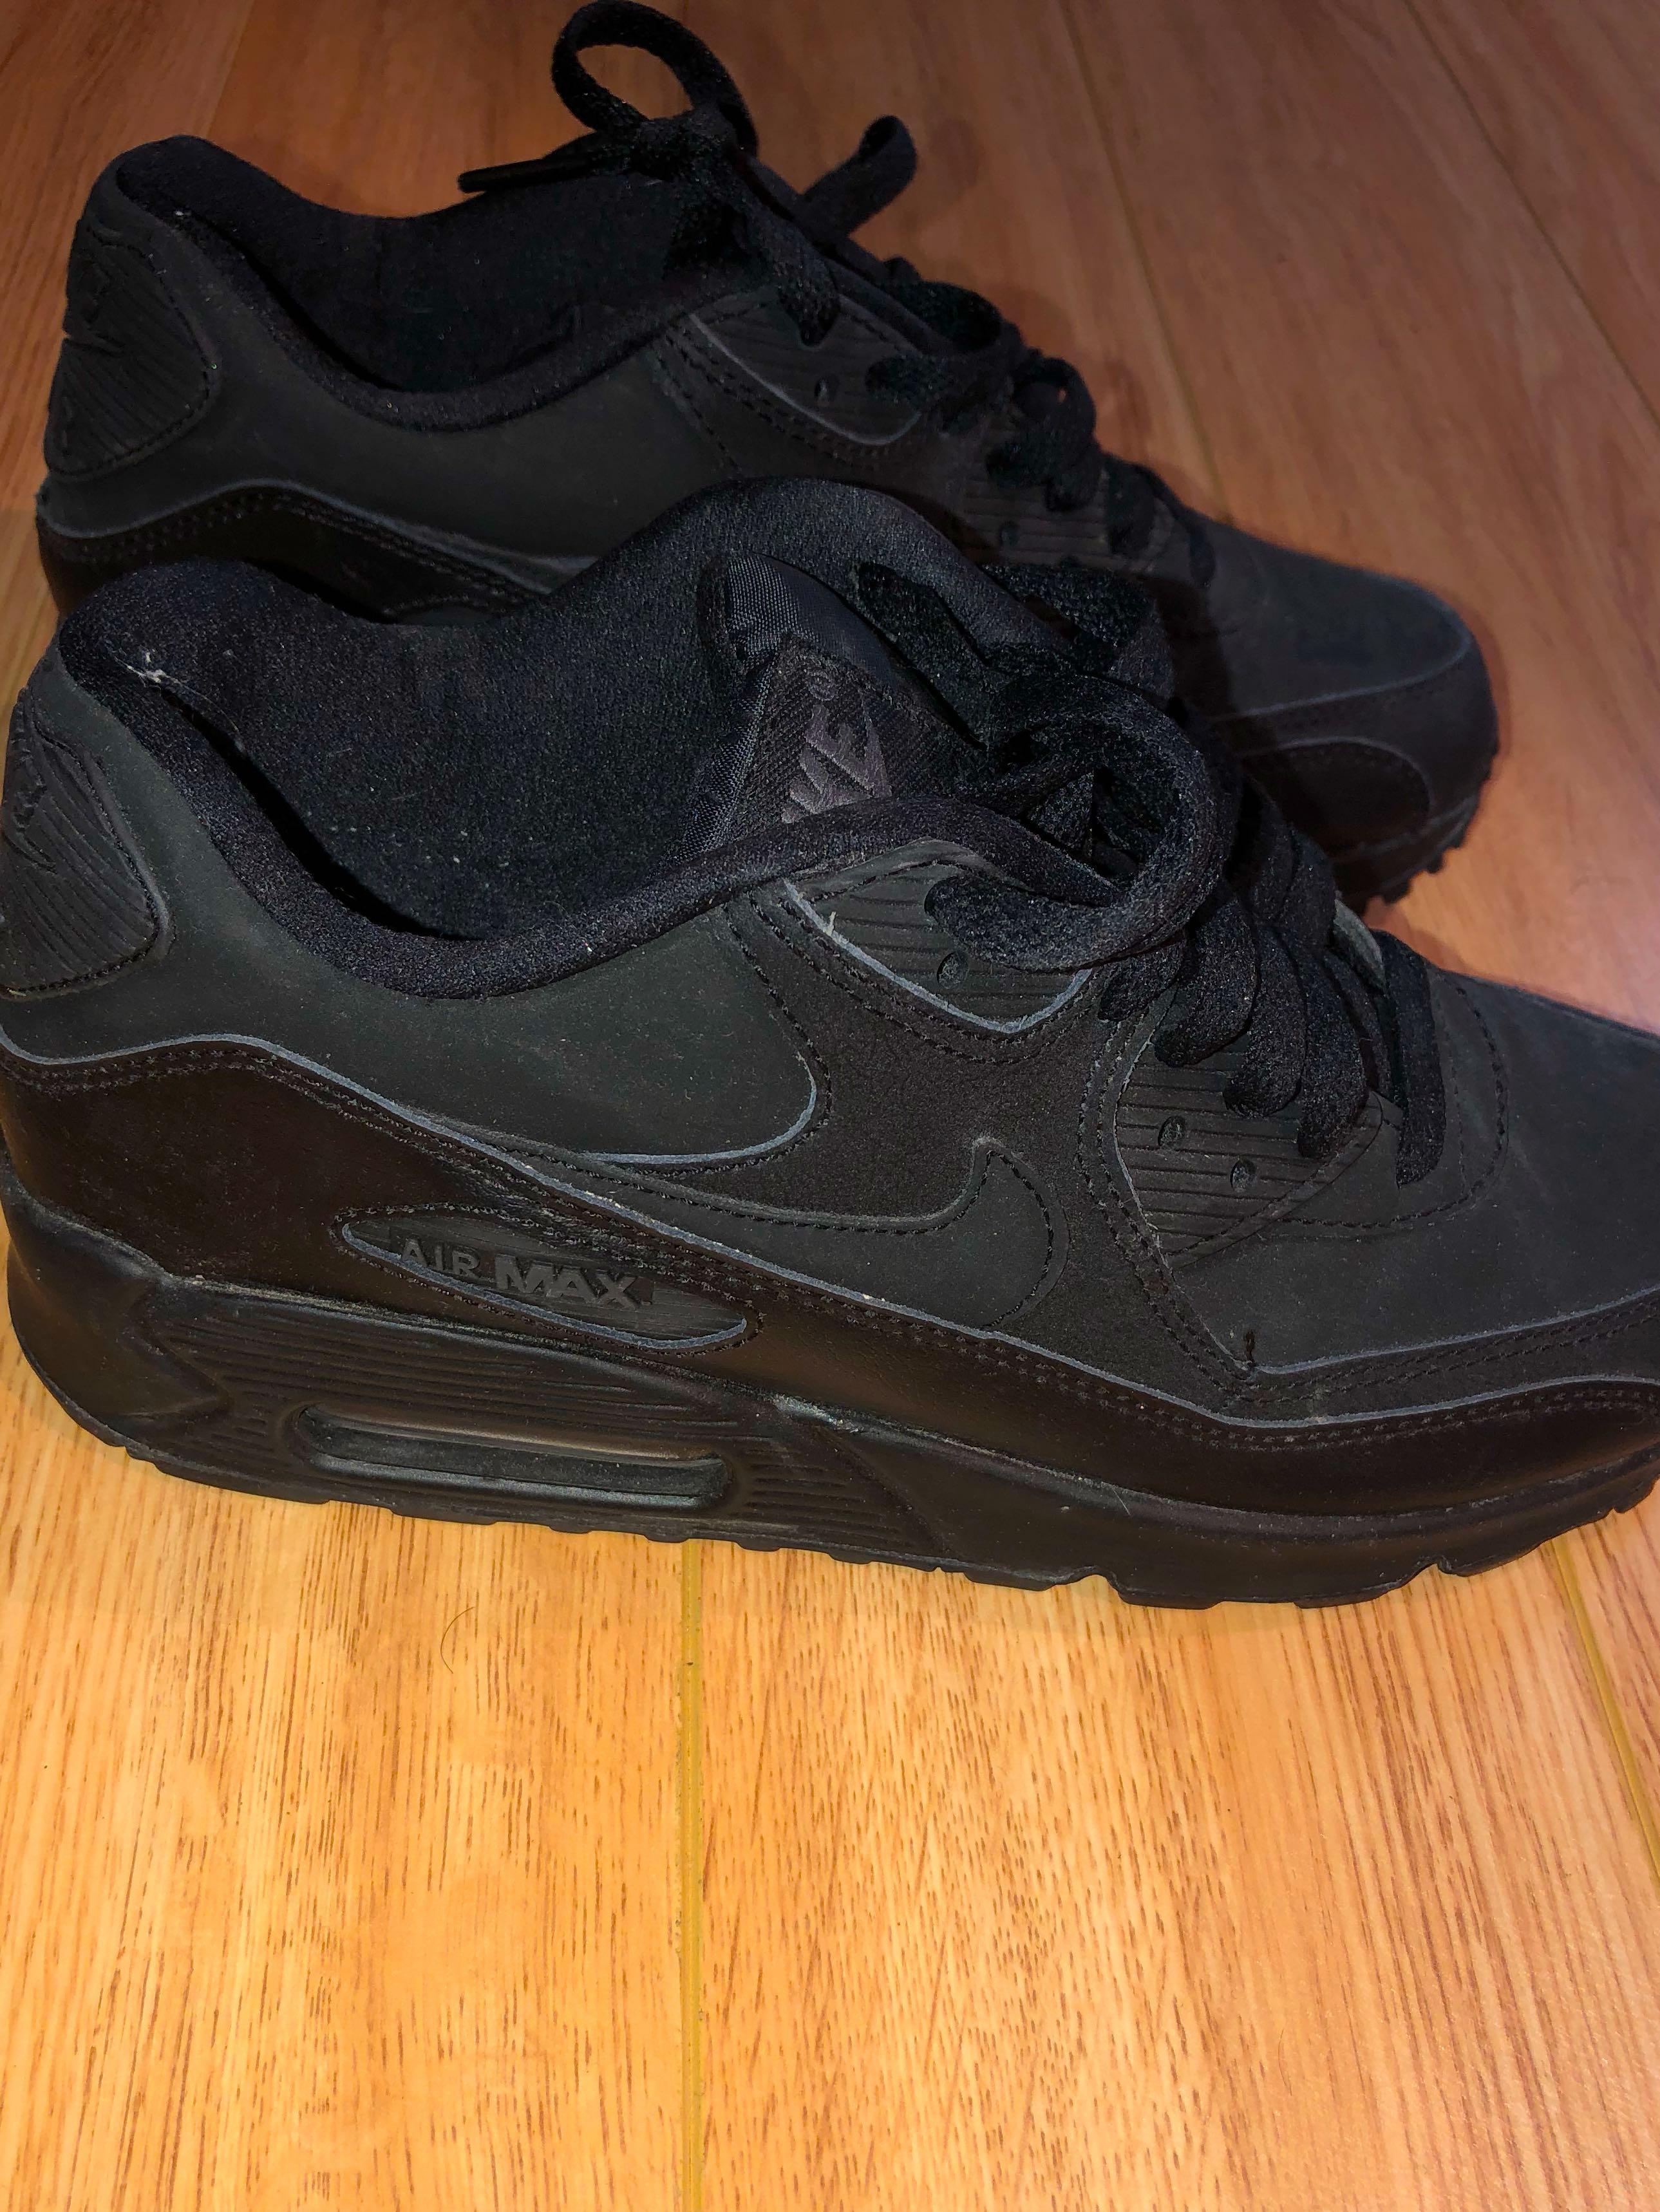 Black on Black AirMax90 - 5.5Y/7.5W